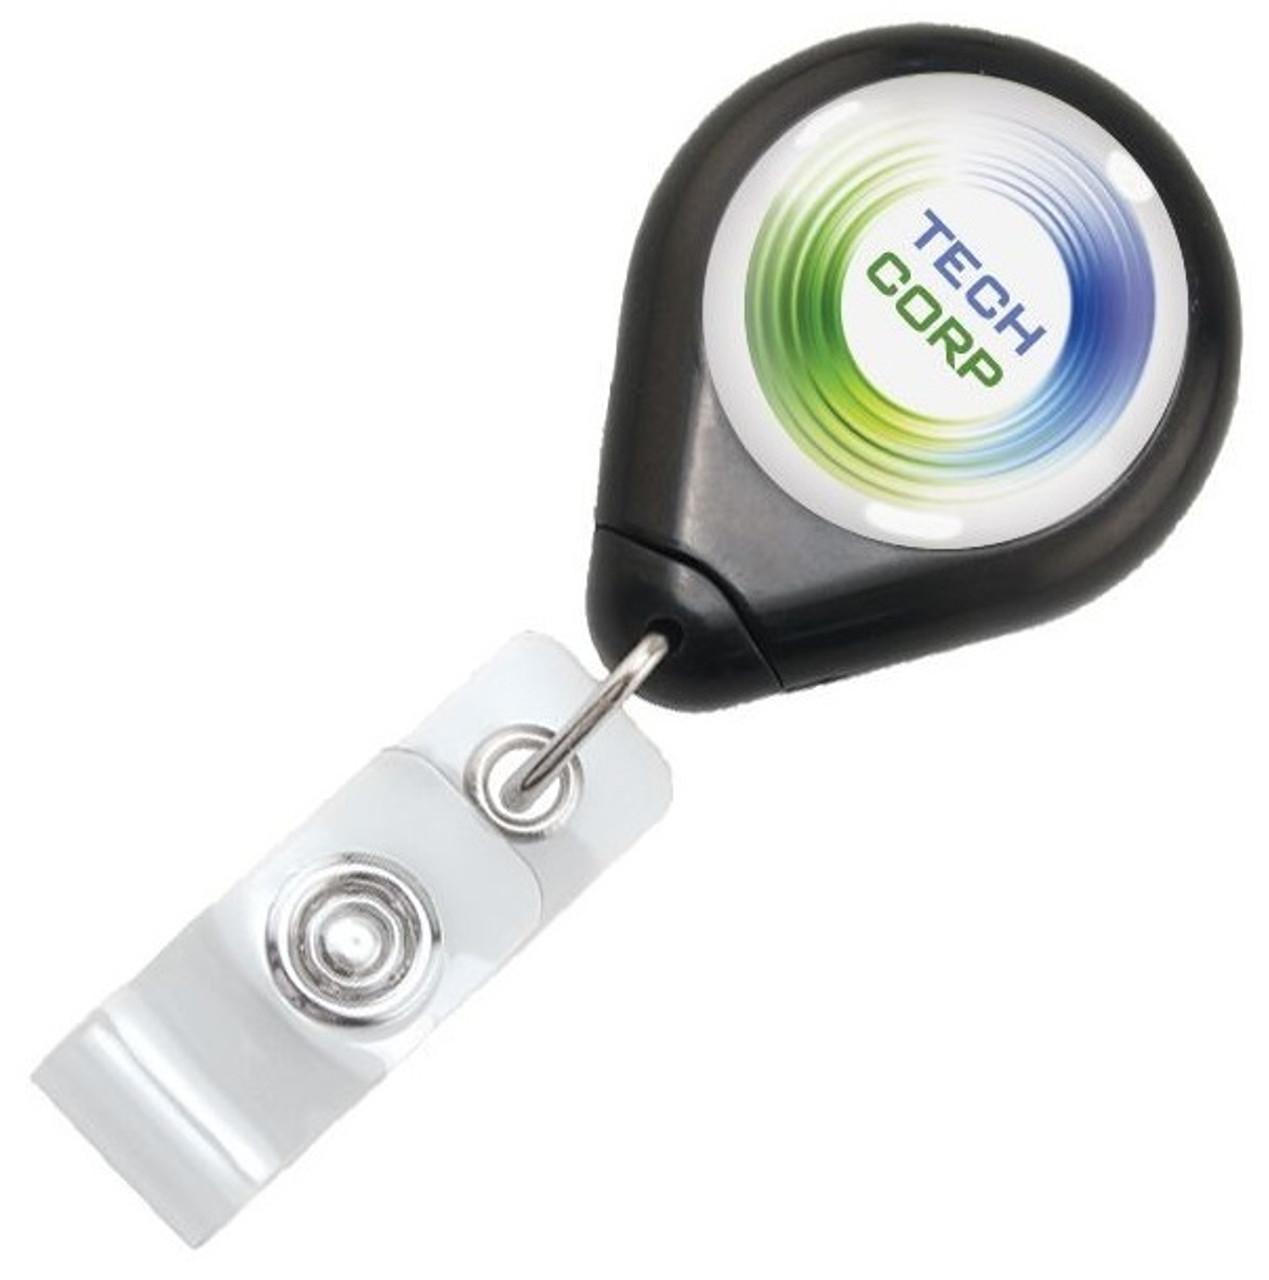 Premium Twist-Free Badge Reel with Swivel Clip